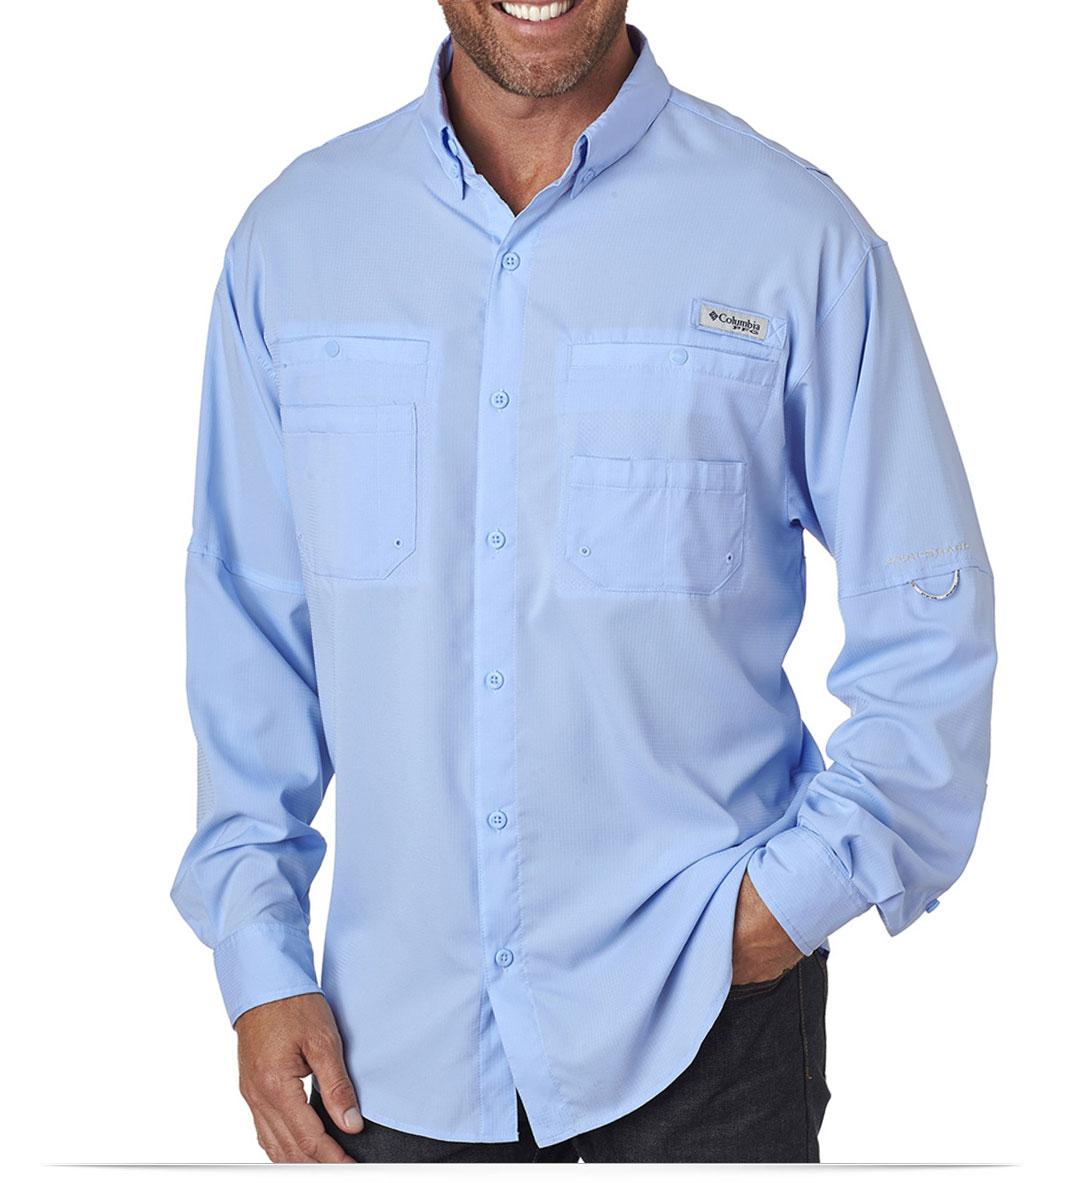 Design Columbia Men's Long-Sleeve Shirt